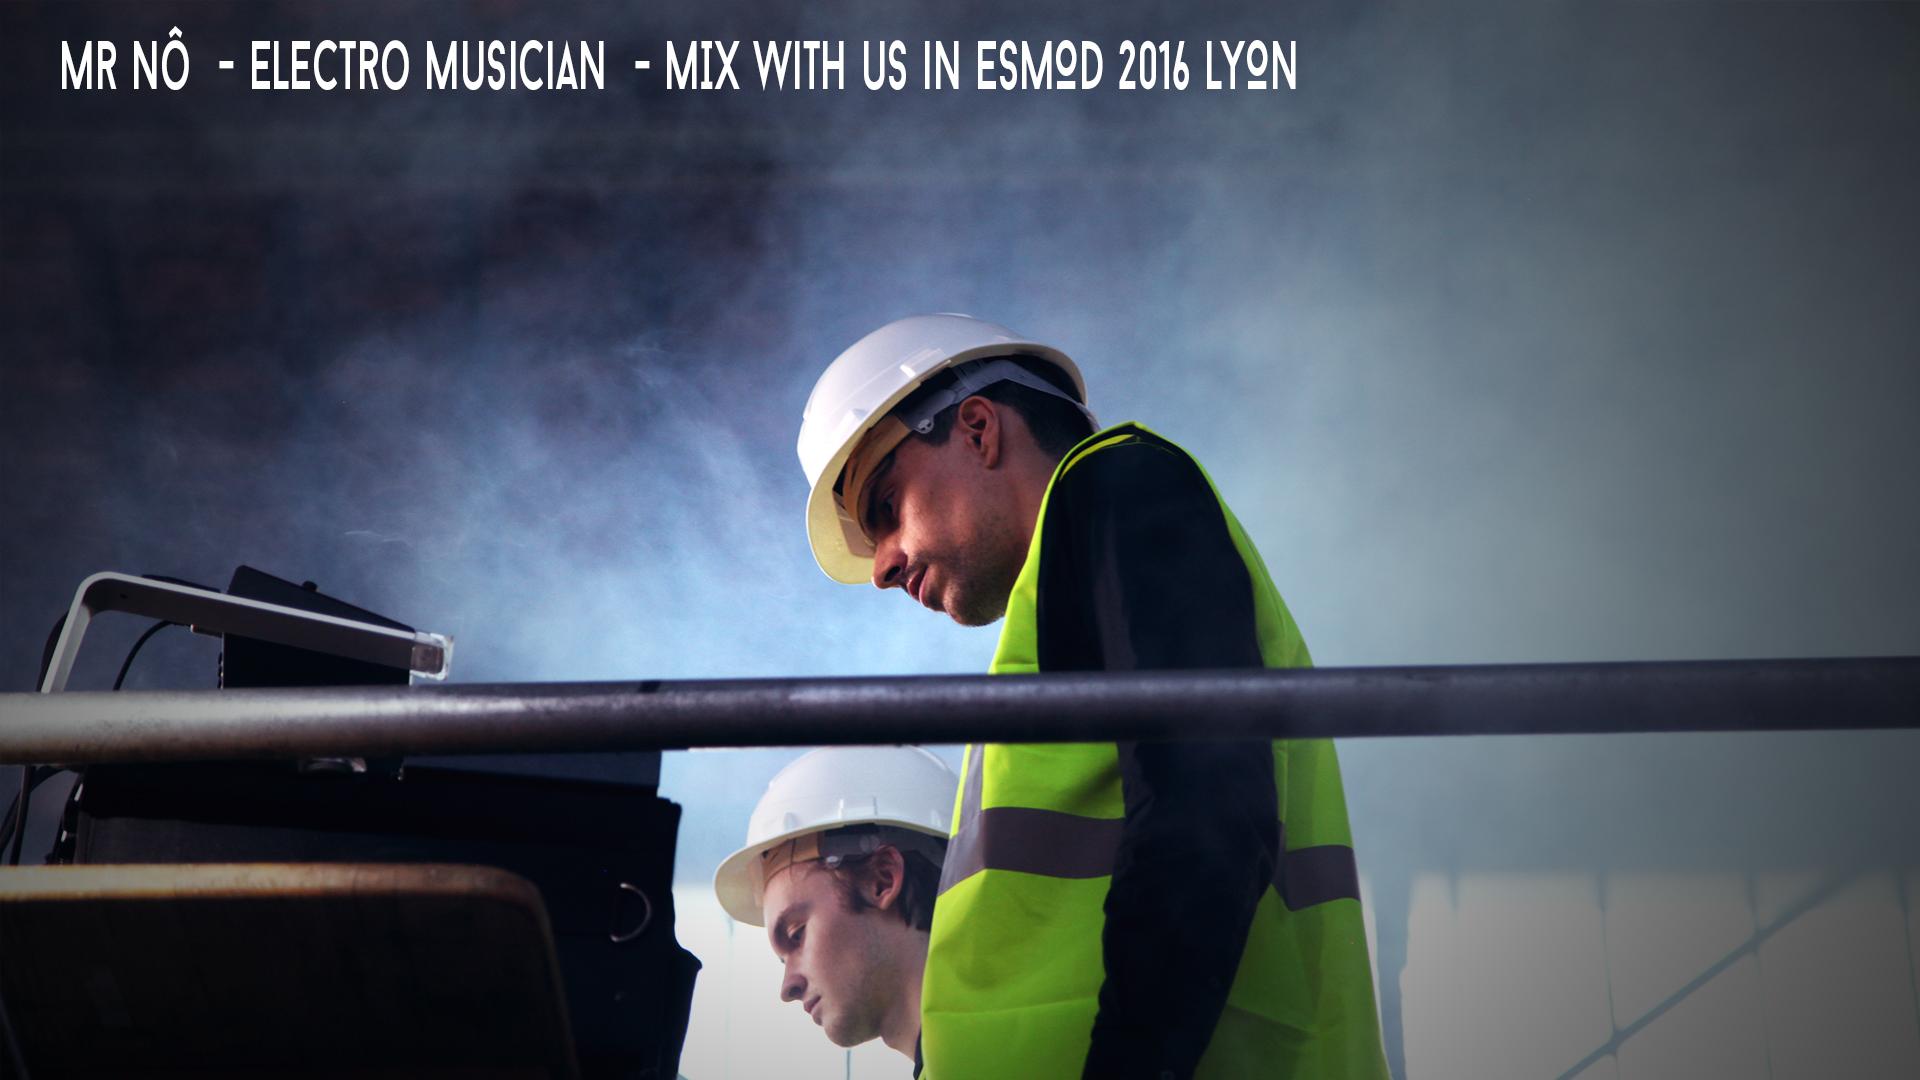 Mr nô mix with us  ESMOD LYON